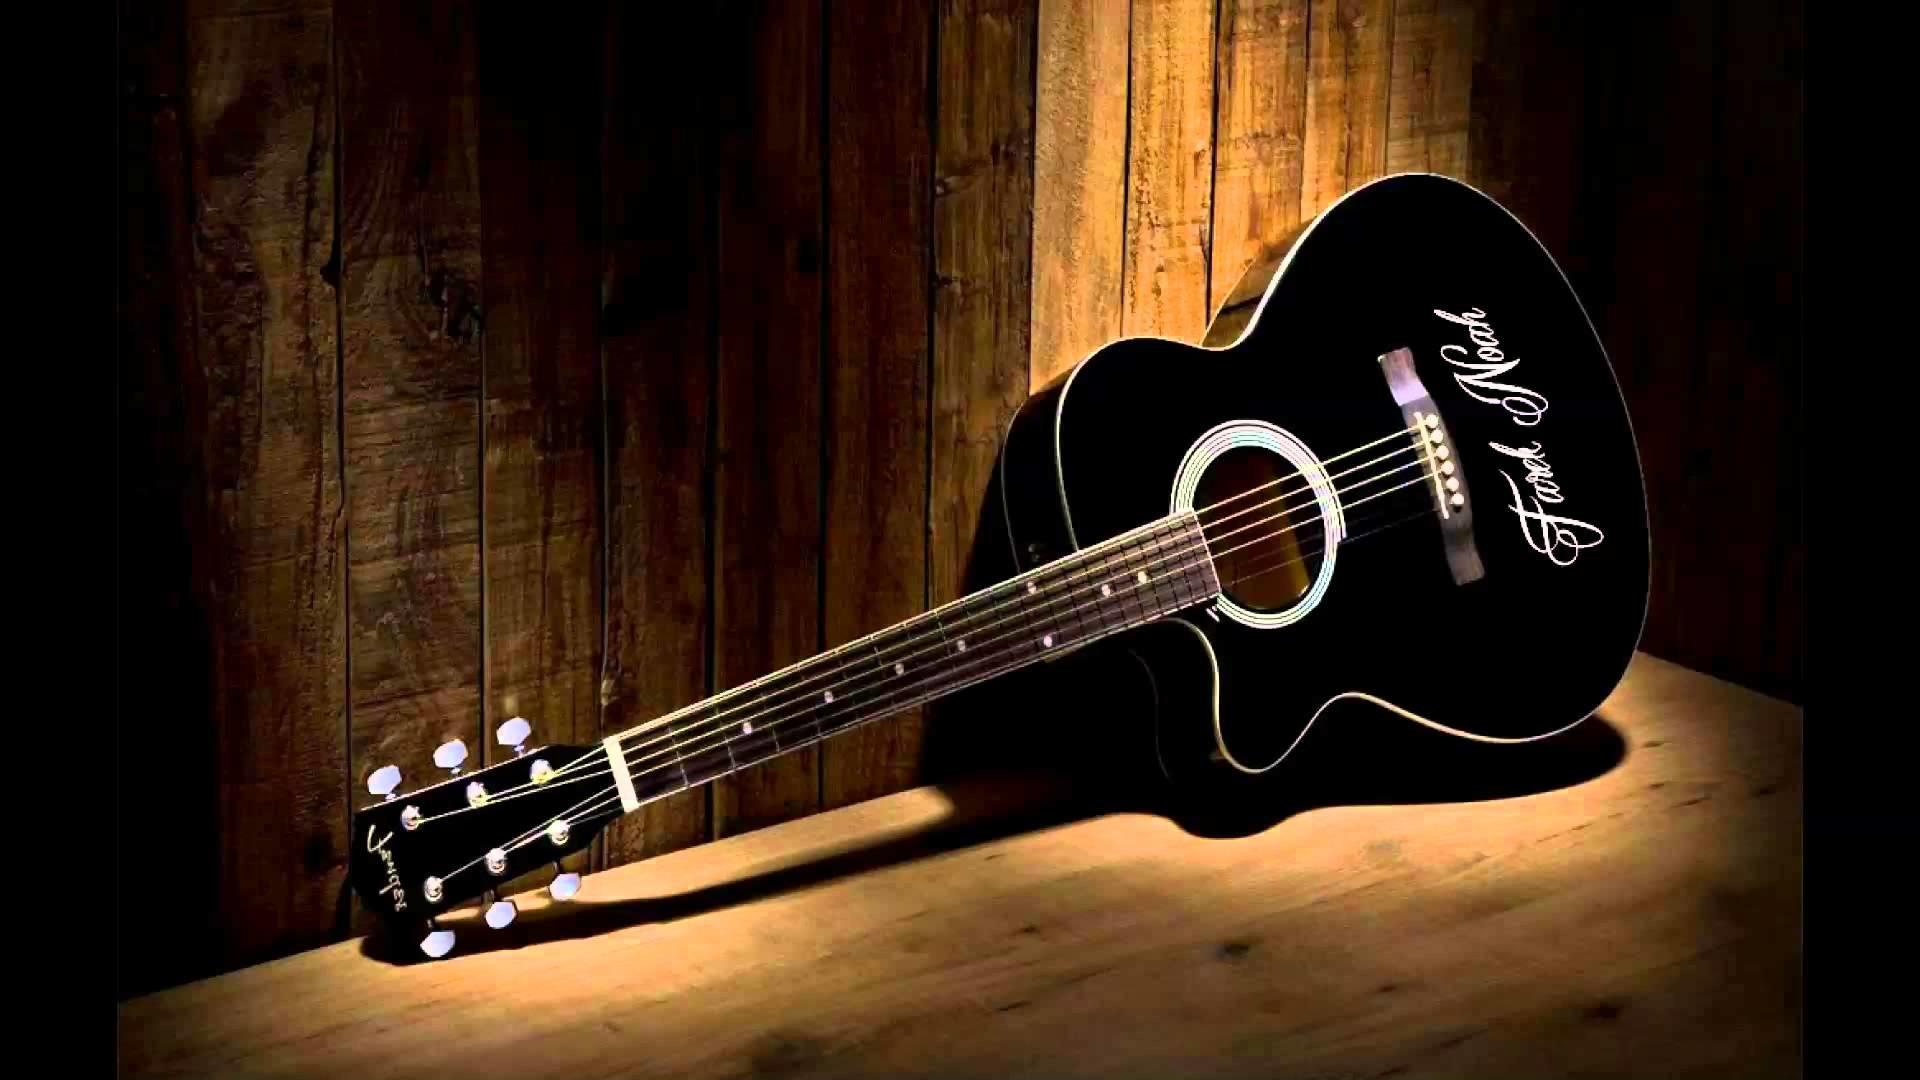 Fender Acoustic Guitar Wallpaper